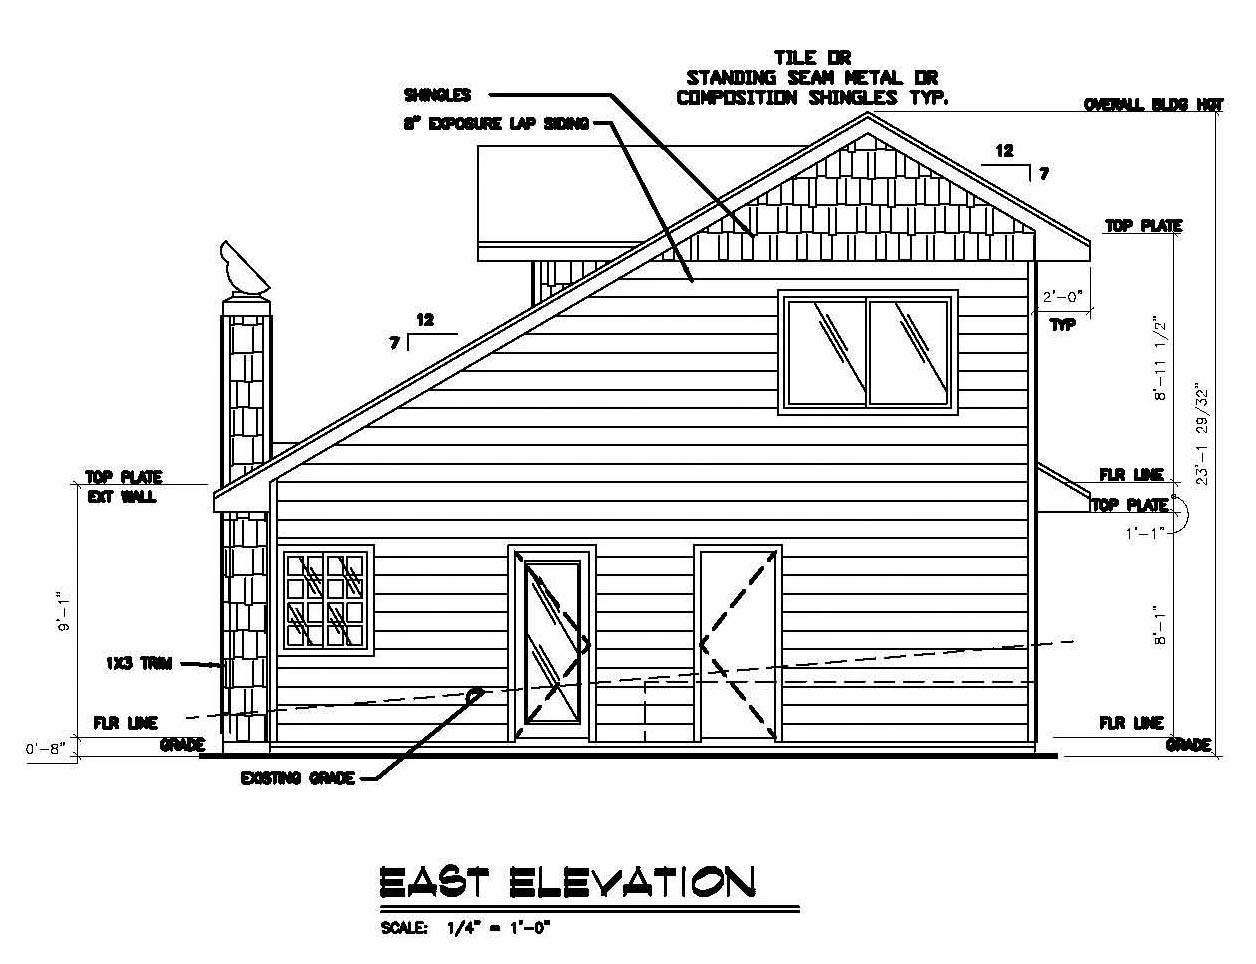 Craftsman House Plan 86749 with 3 Beds, 2 Baths, 1 Car Garage Rear Elevation